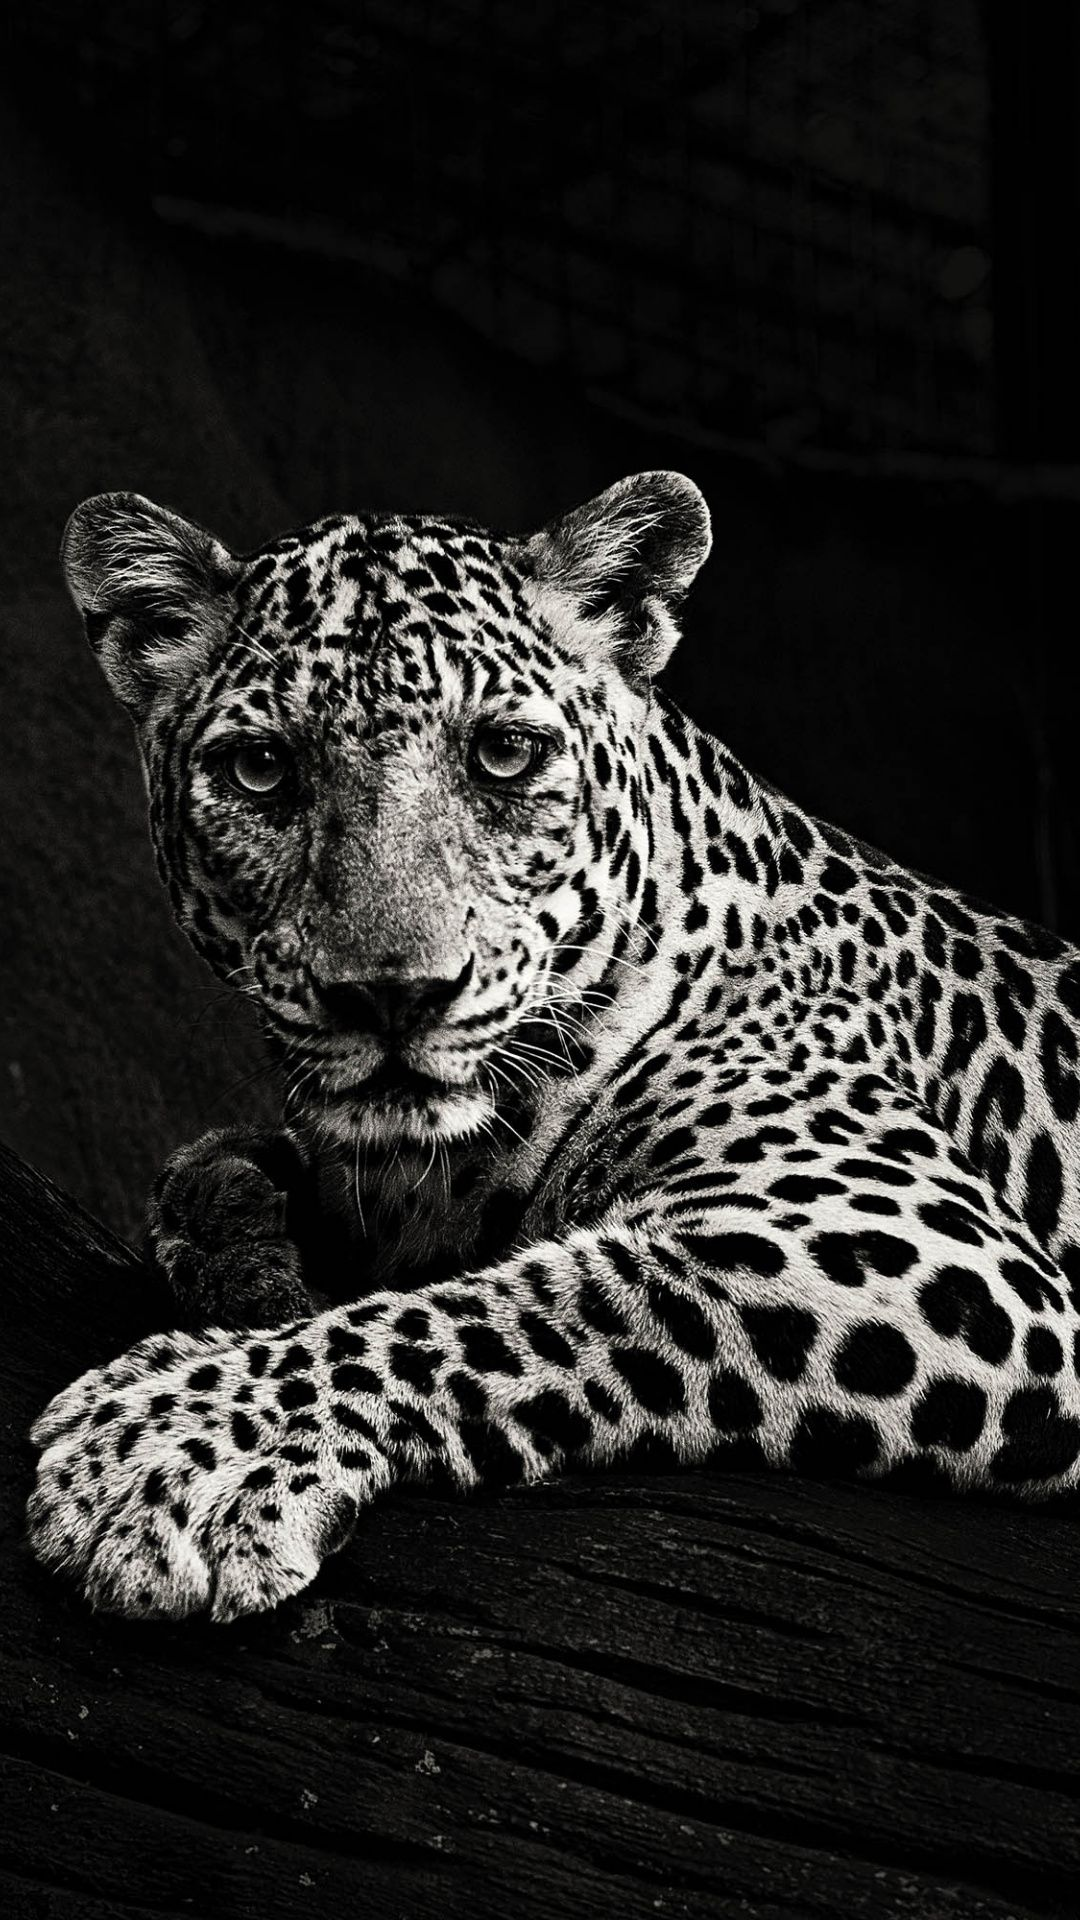 Black And White Predator Leopard Wallpaper Leopard Wallpaper Animals Black And White Animal Photography